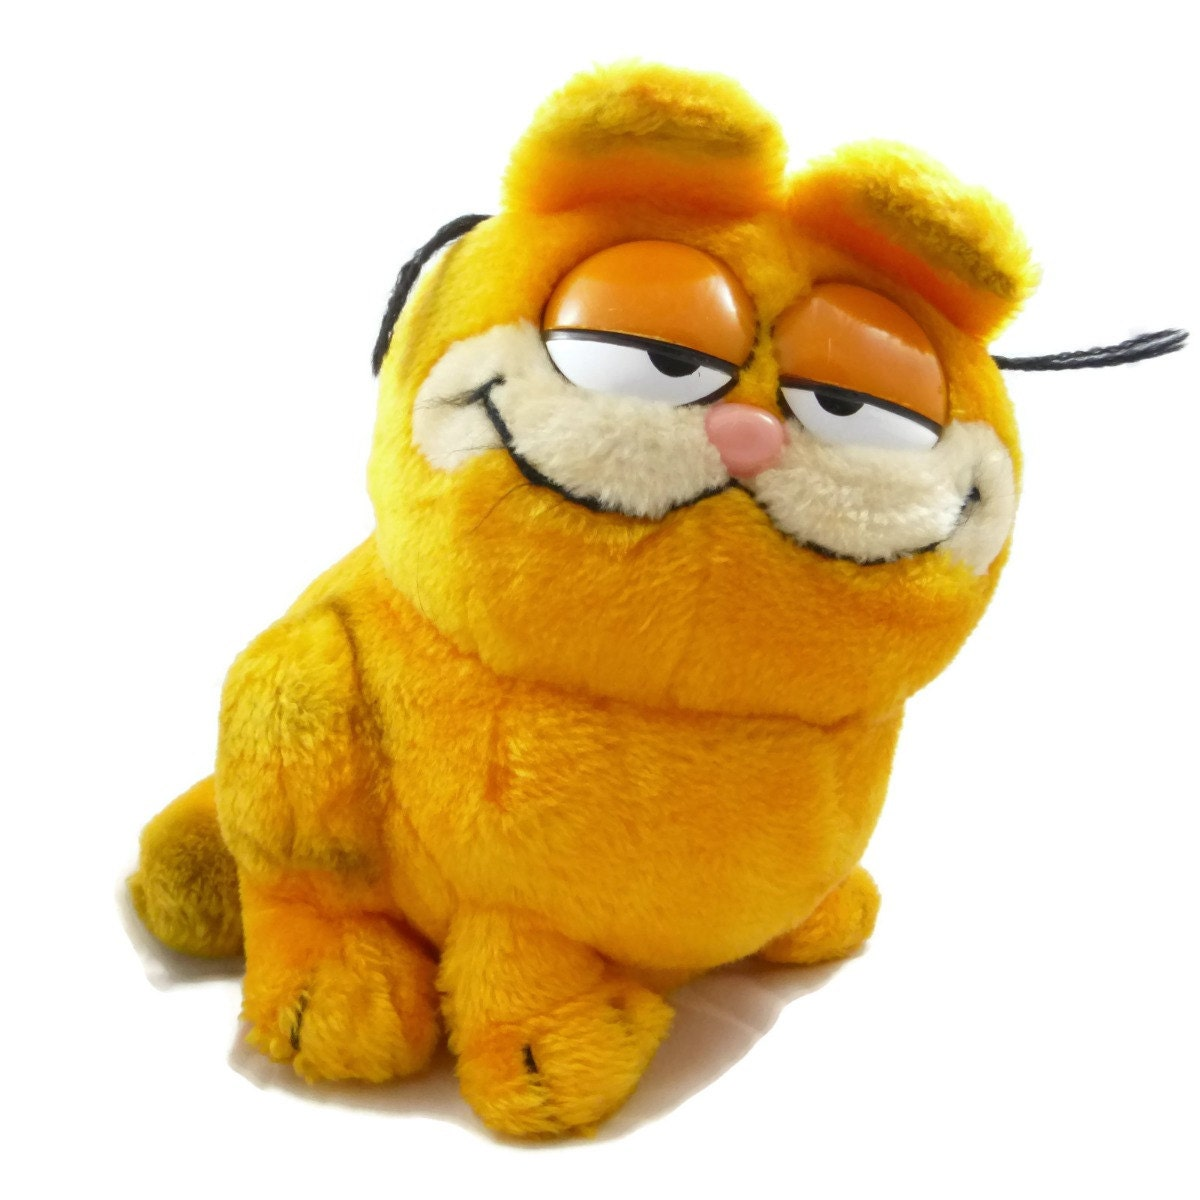 Garfield Cat Plush Stuffed Animal Toy